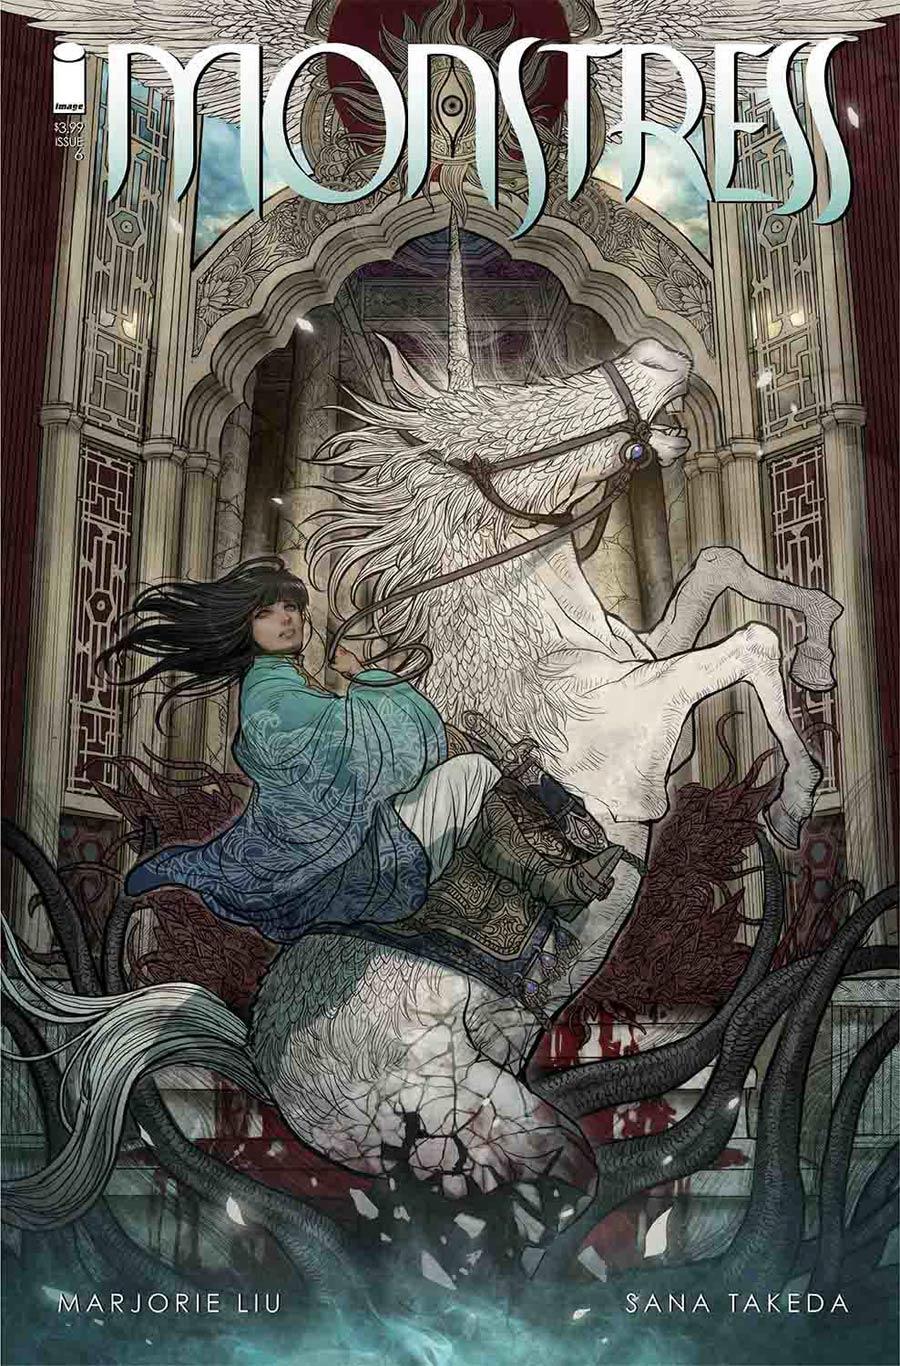 Monstress - Marjorie Liu (W), Sana Takeda (A) • Image Comics